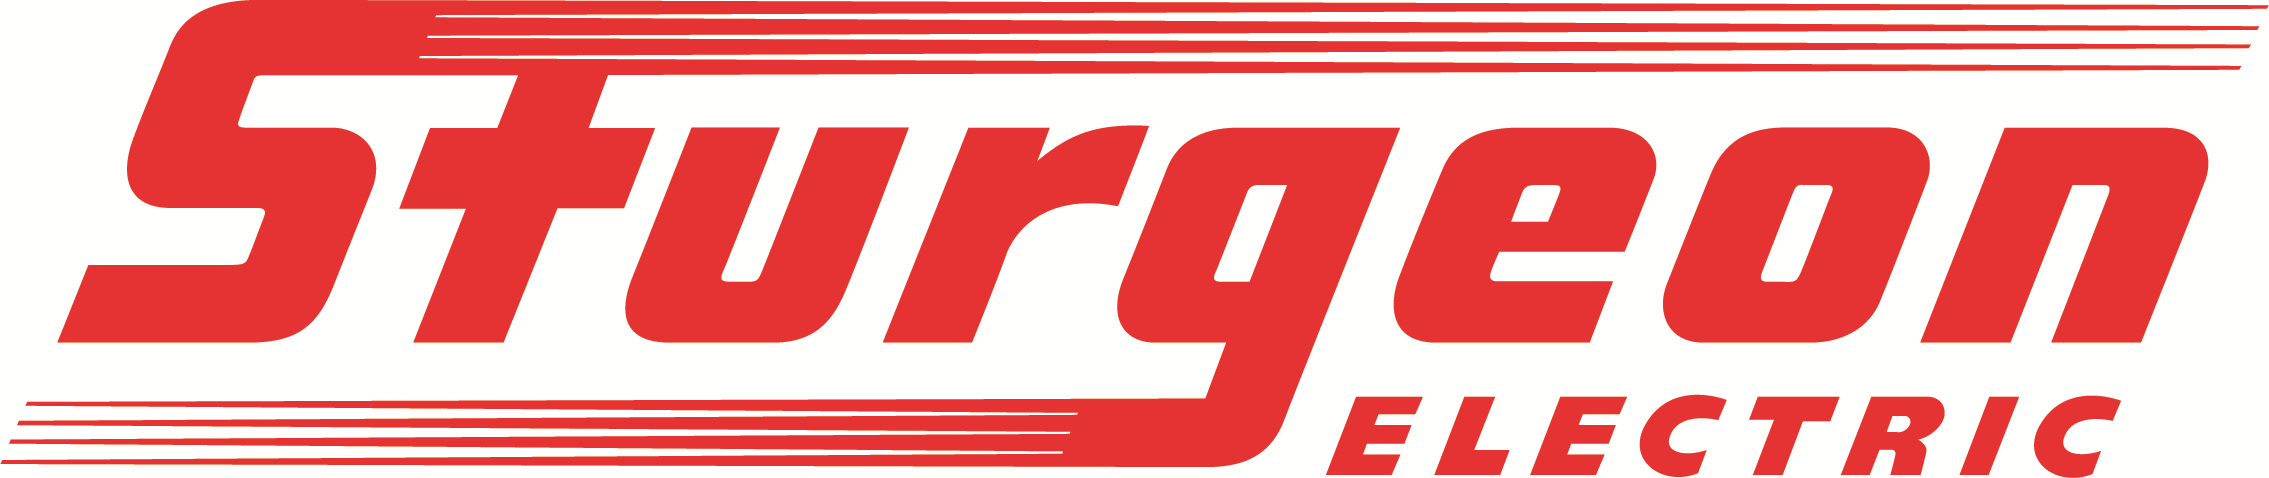 STURGEON ELECTRIC COMPANY, INC. logo